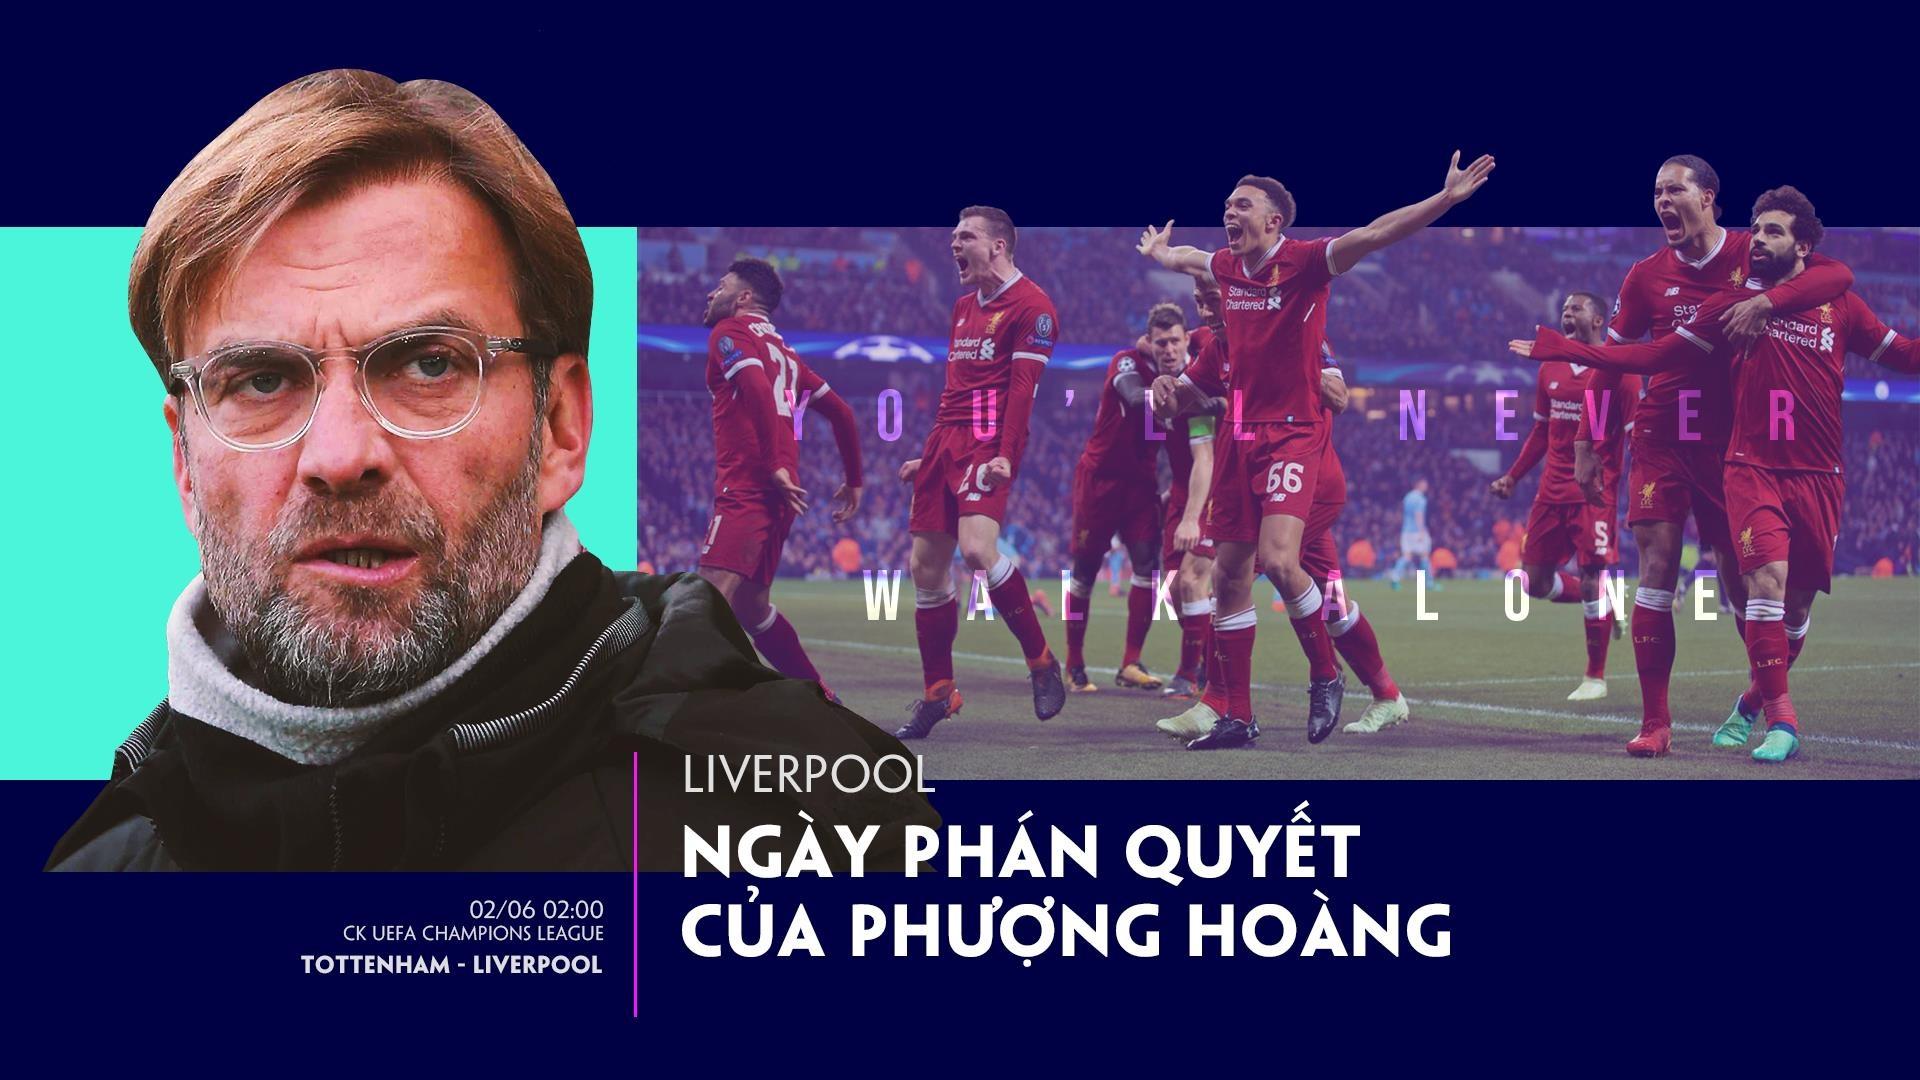 Liverpool va ngay phan quyet vinh quang Champions League hinh anh 2